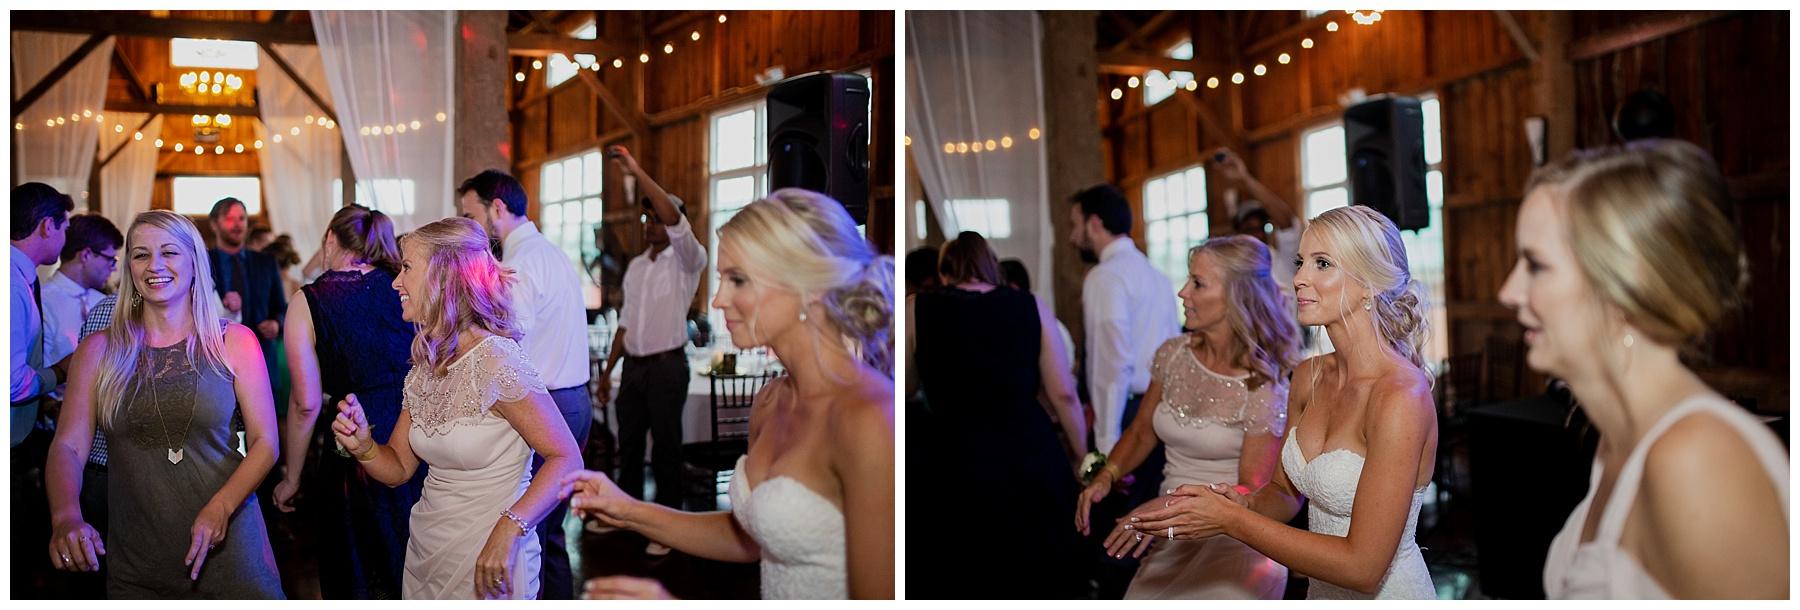 WISCONSIN WEDDING PHOTOGRAPHER 186.jpg